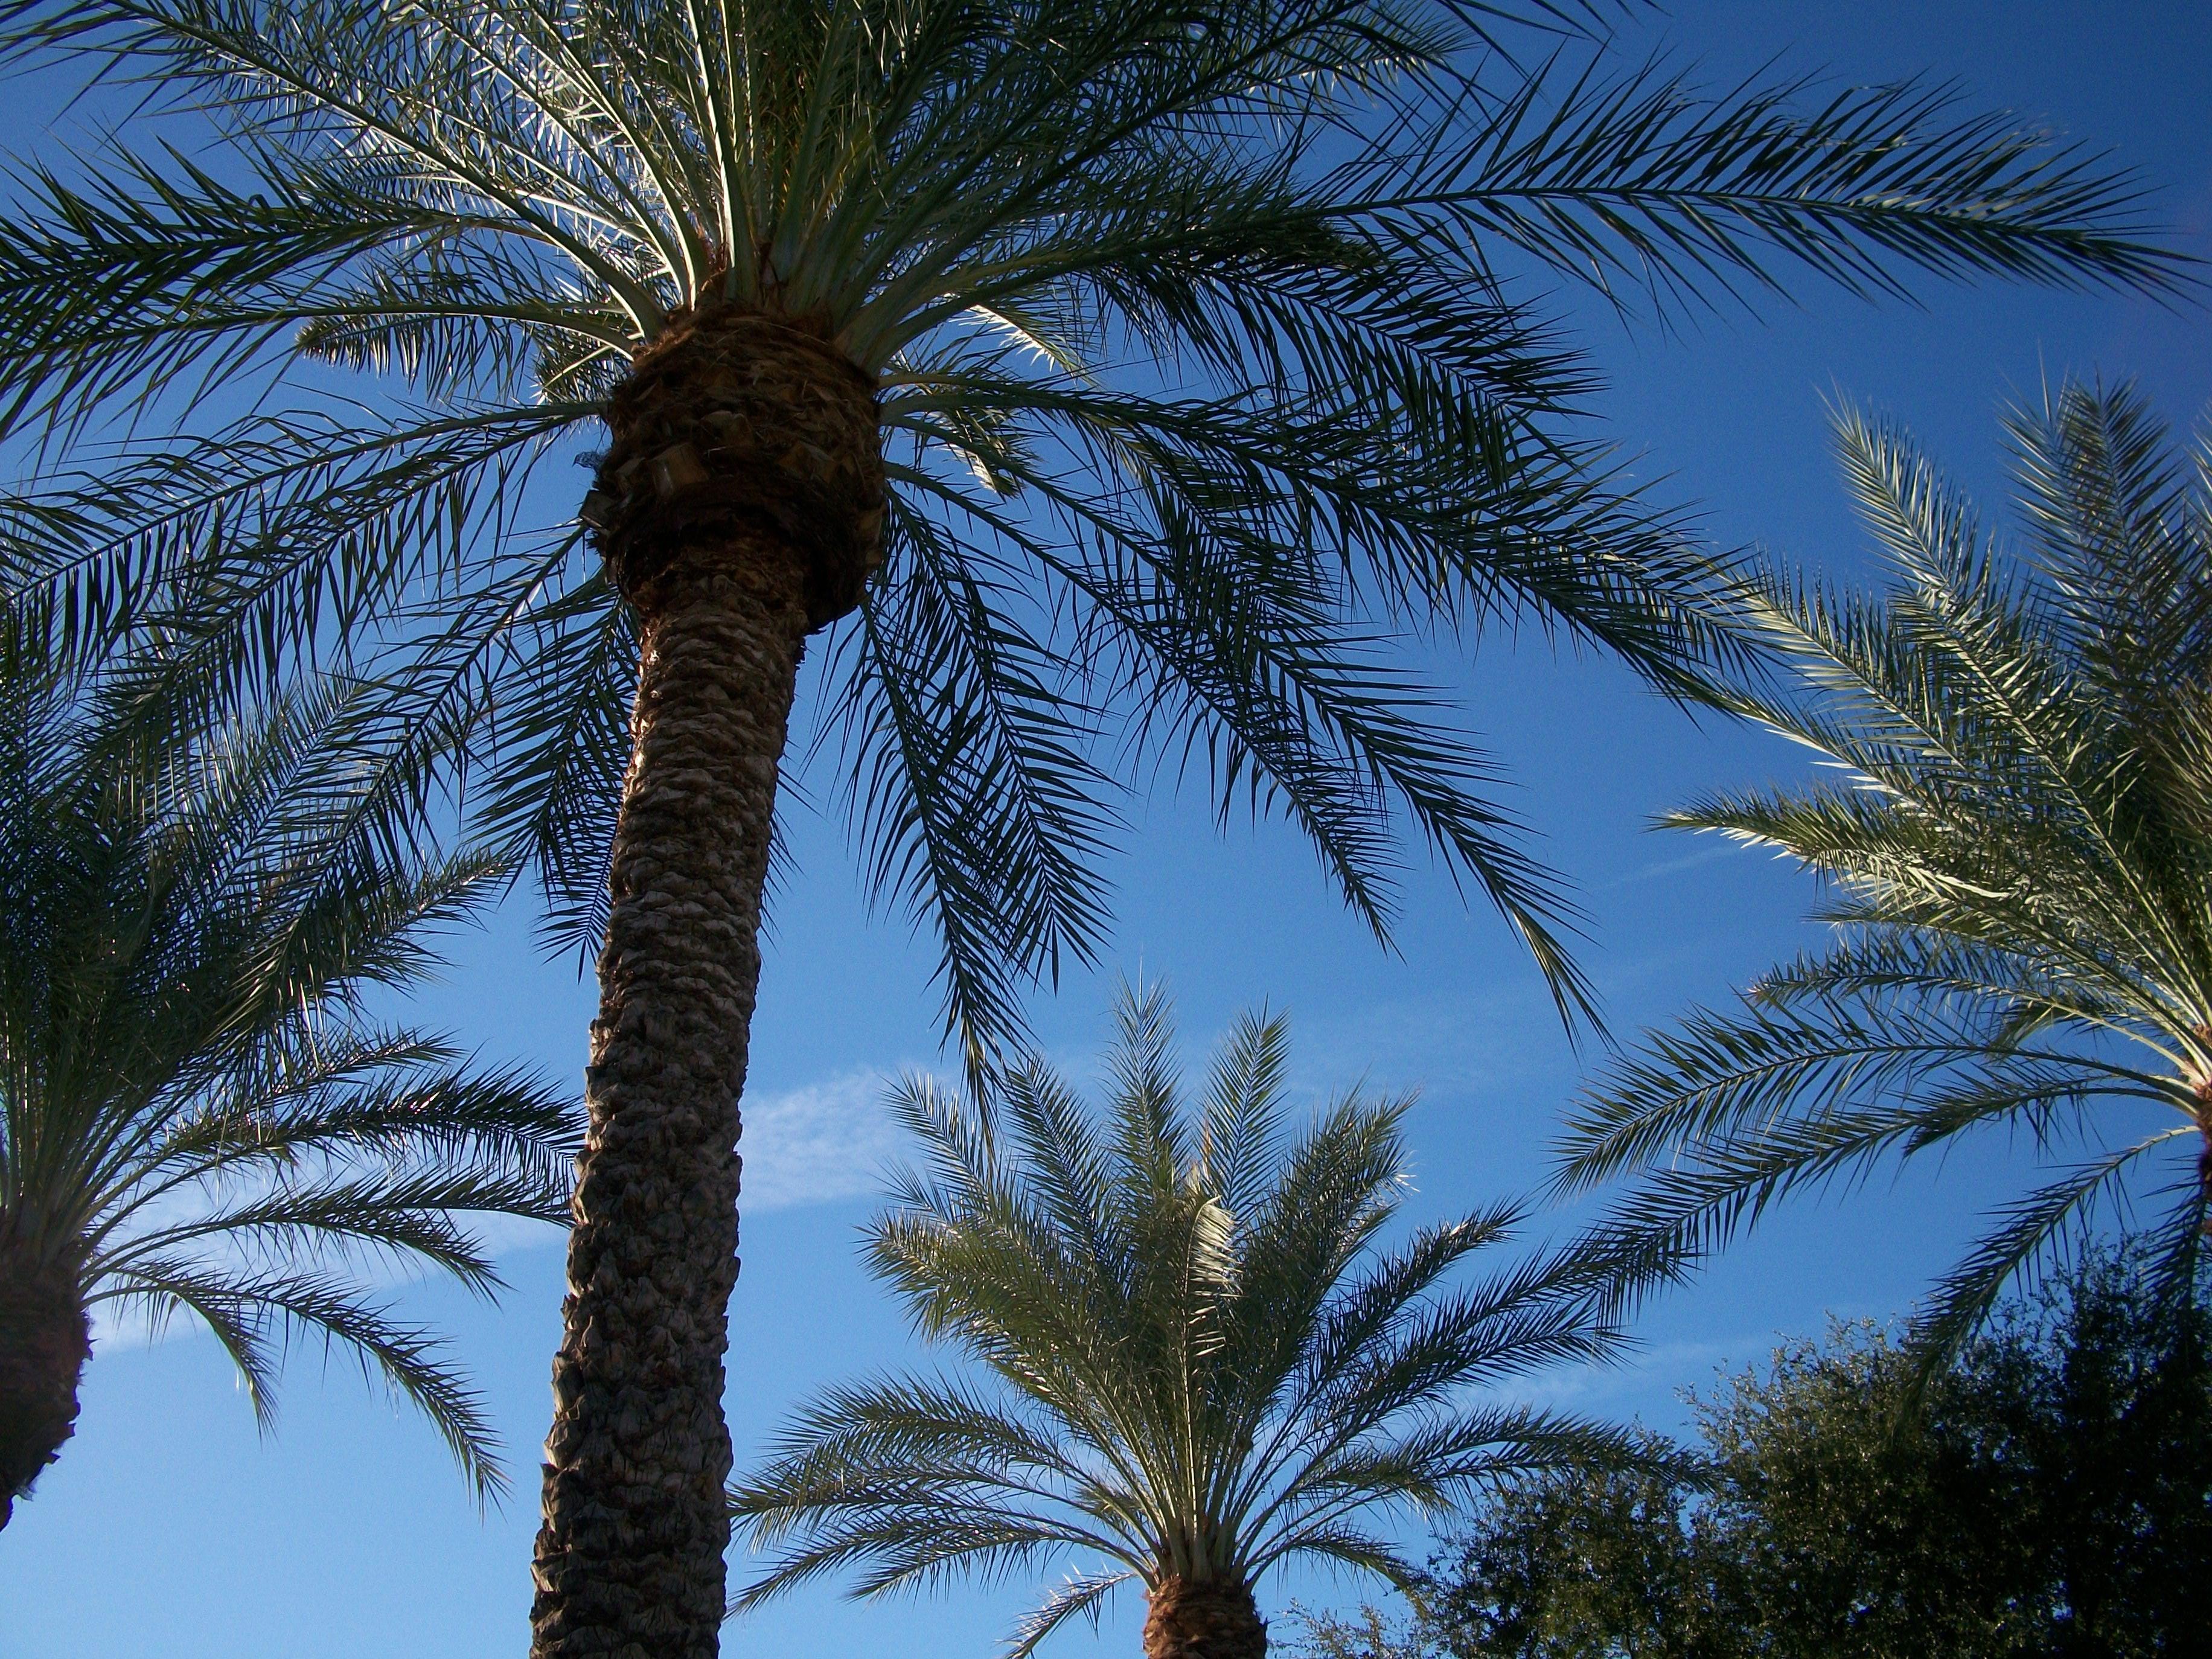 kostenlose foto   baum  ast  himmel  palme  blatt  schwimmbad  produzieren  botanik  tropen